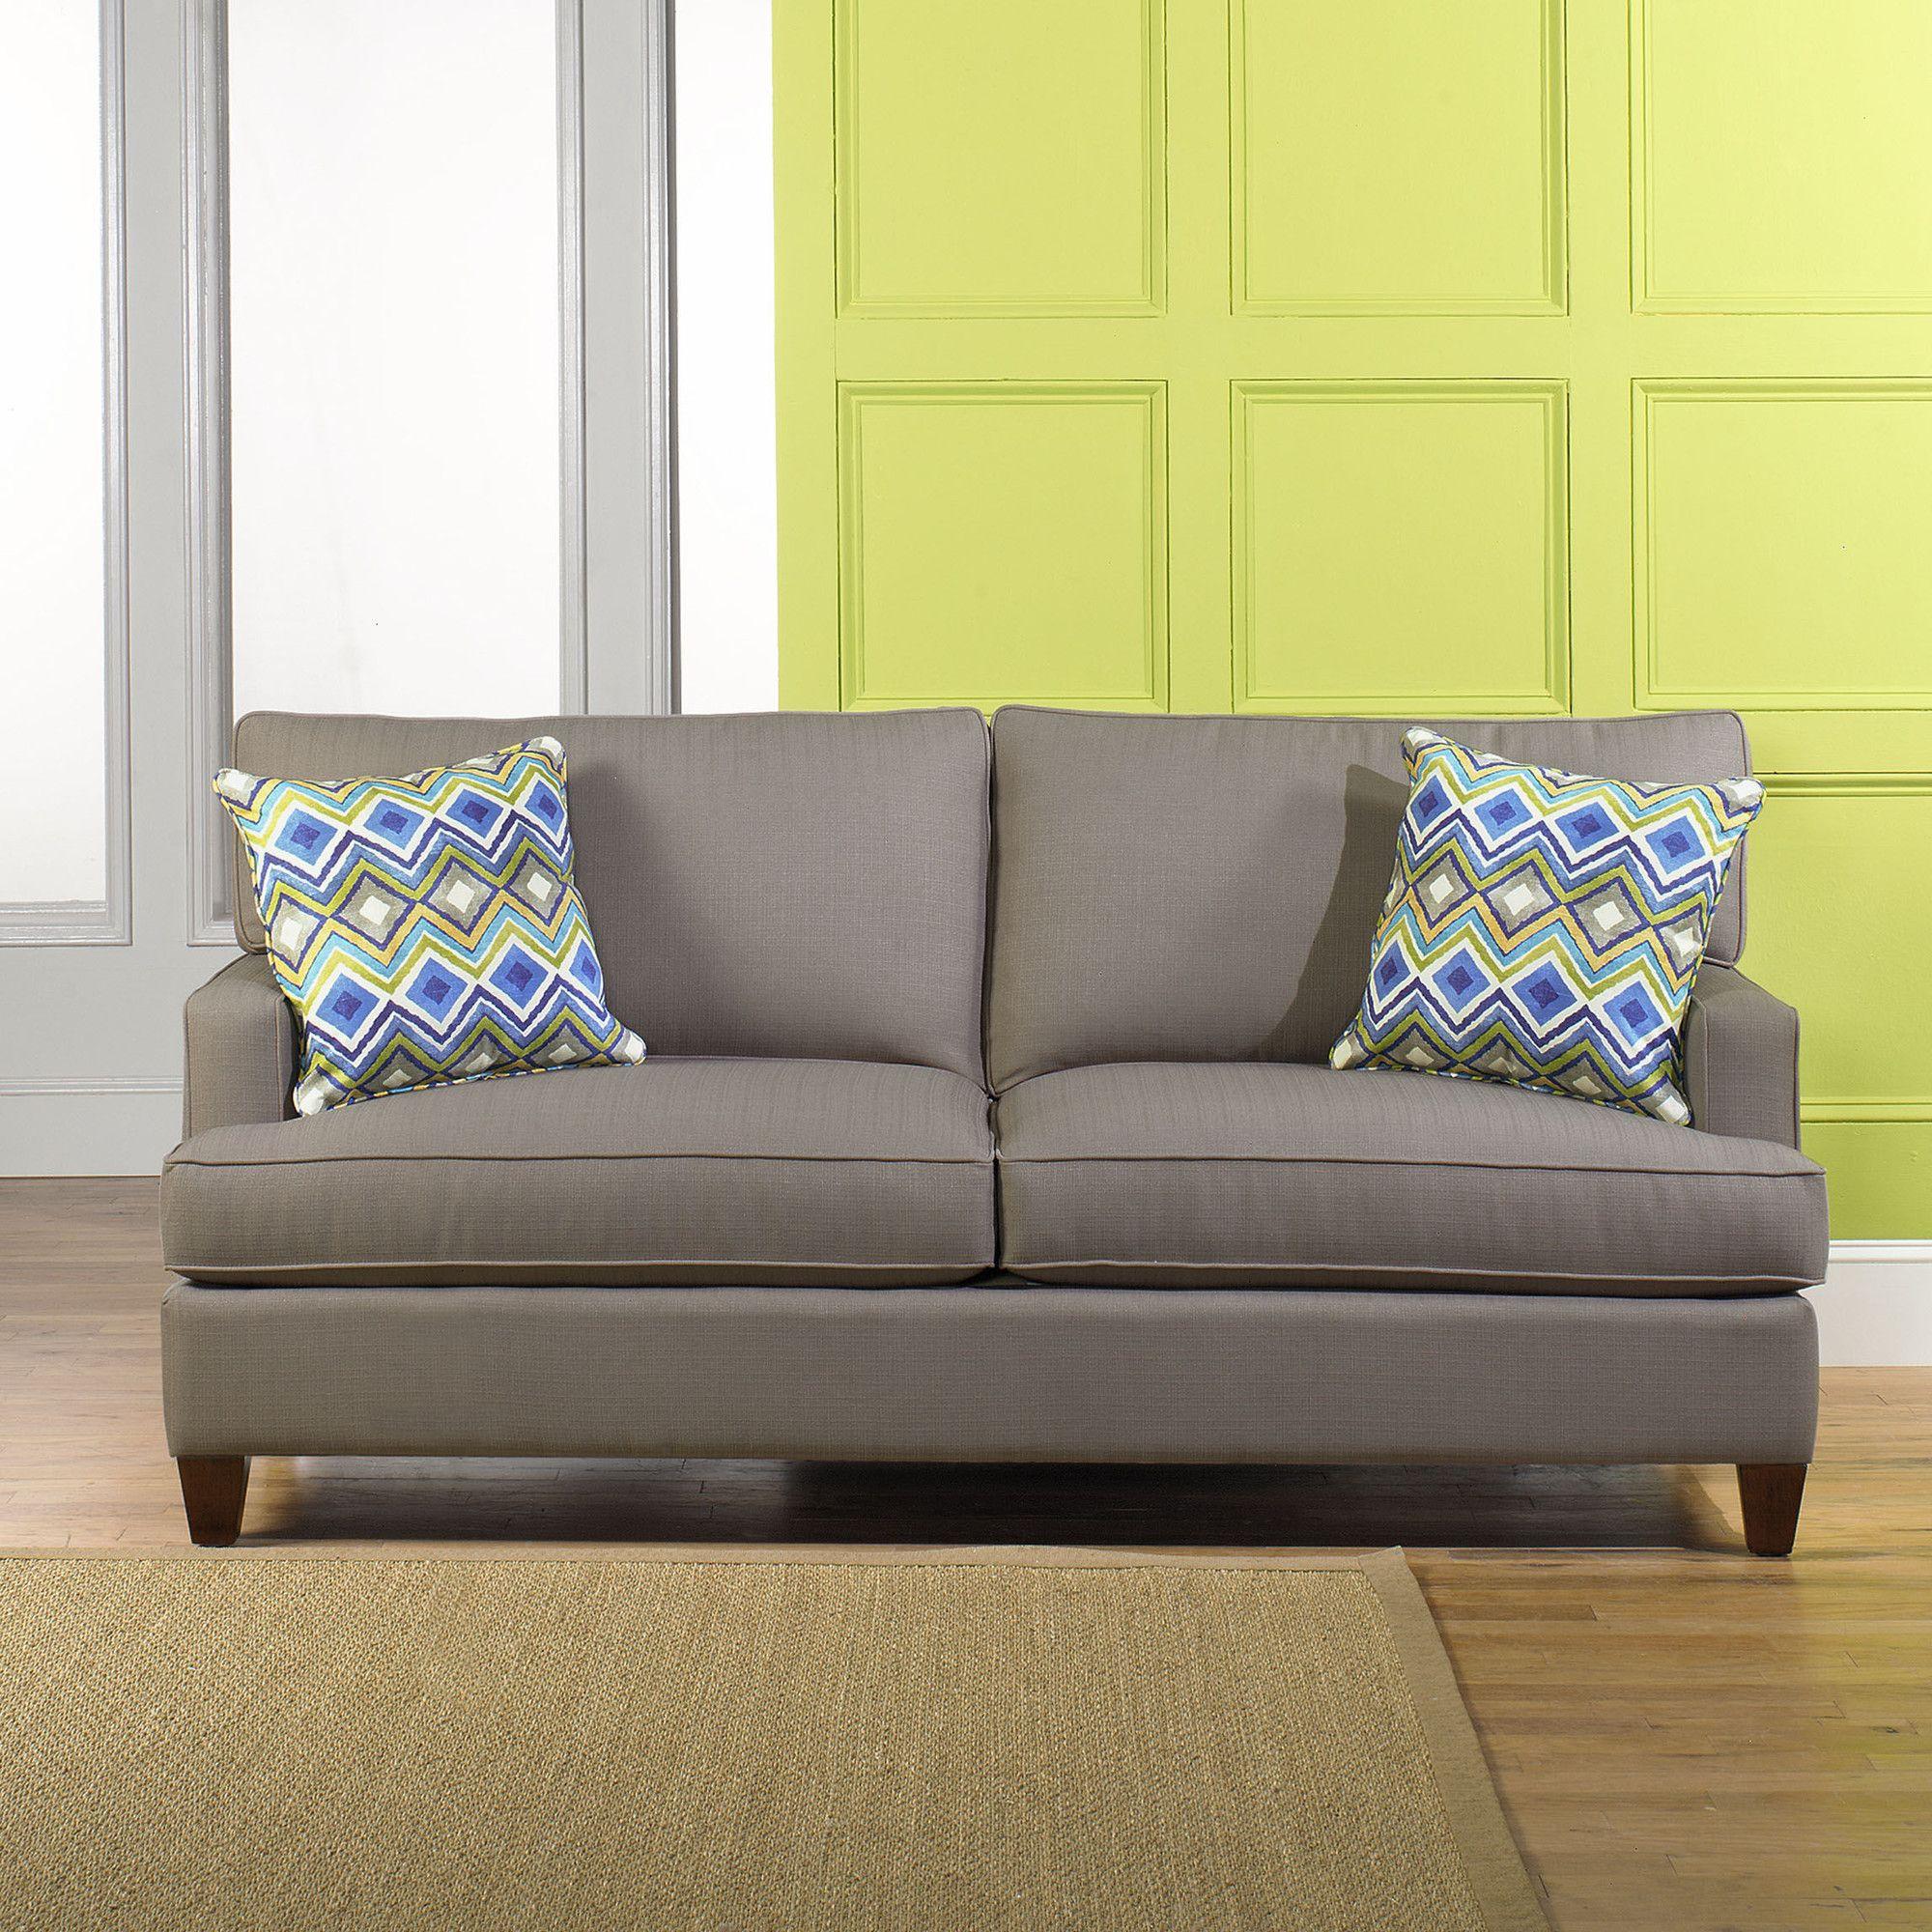 HGTV Home Park Avenue Sleeper Sofa & Reviews Wayfair